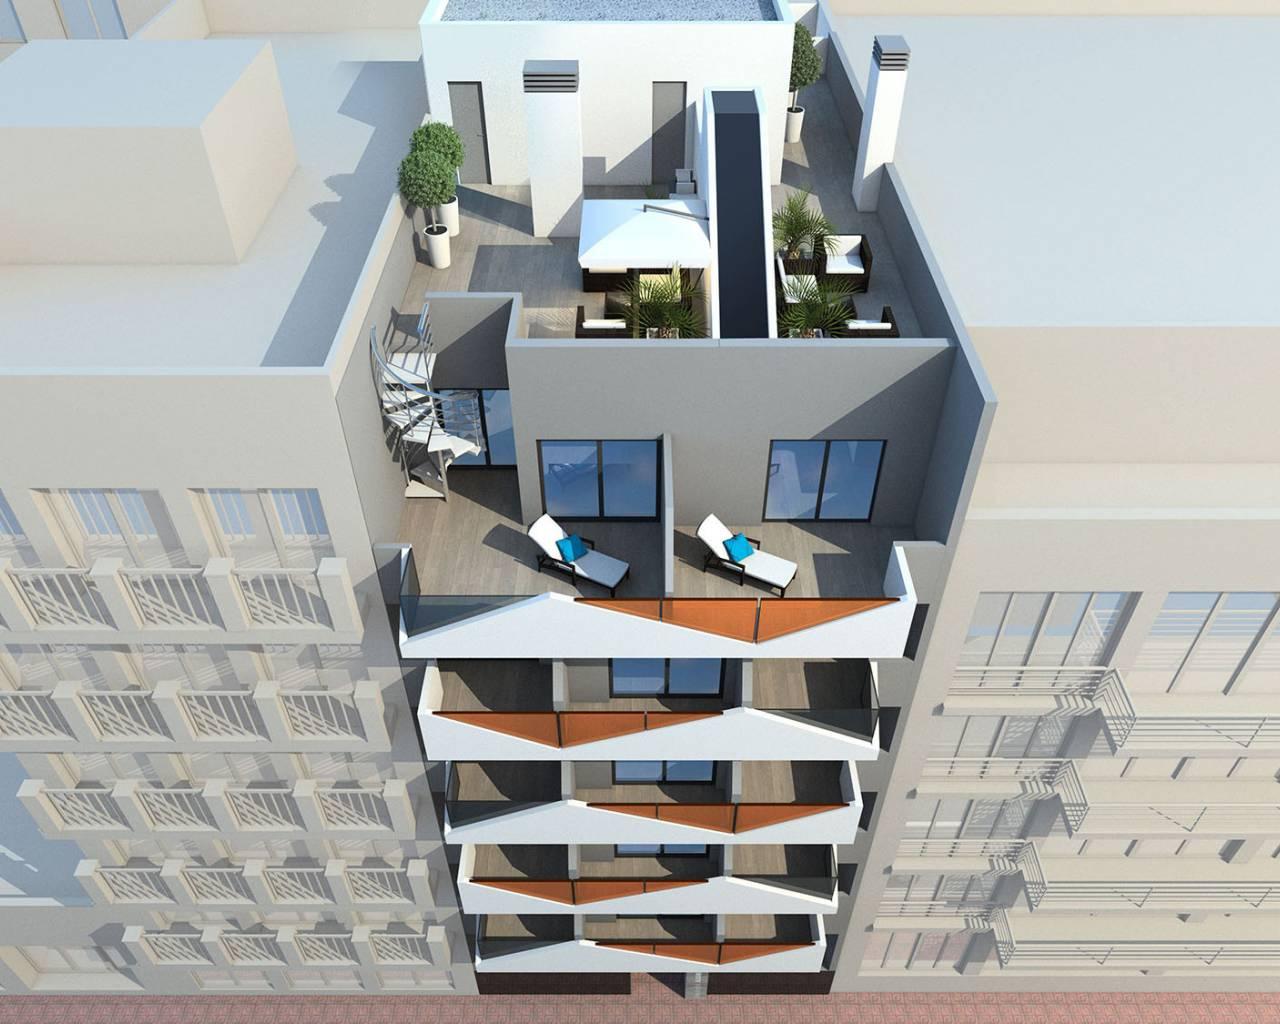 nieuwbouw-appartement-torrevieja-centrum-torrevieja_2798_xl